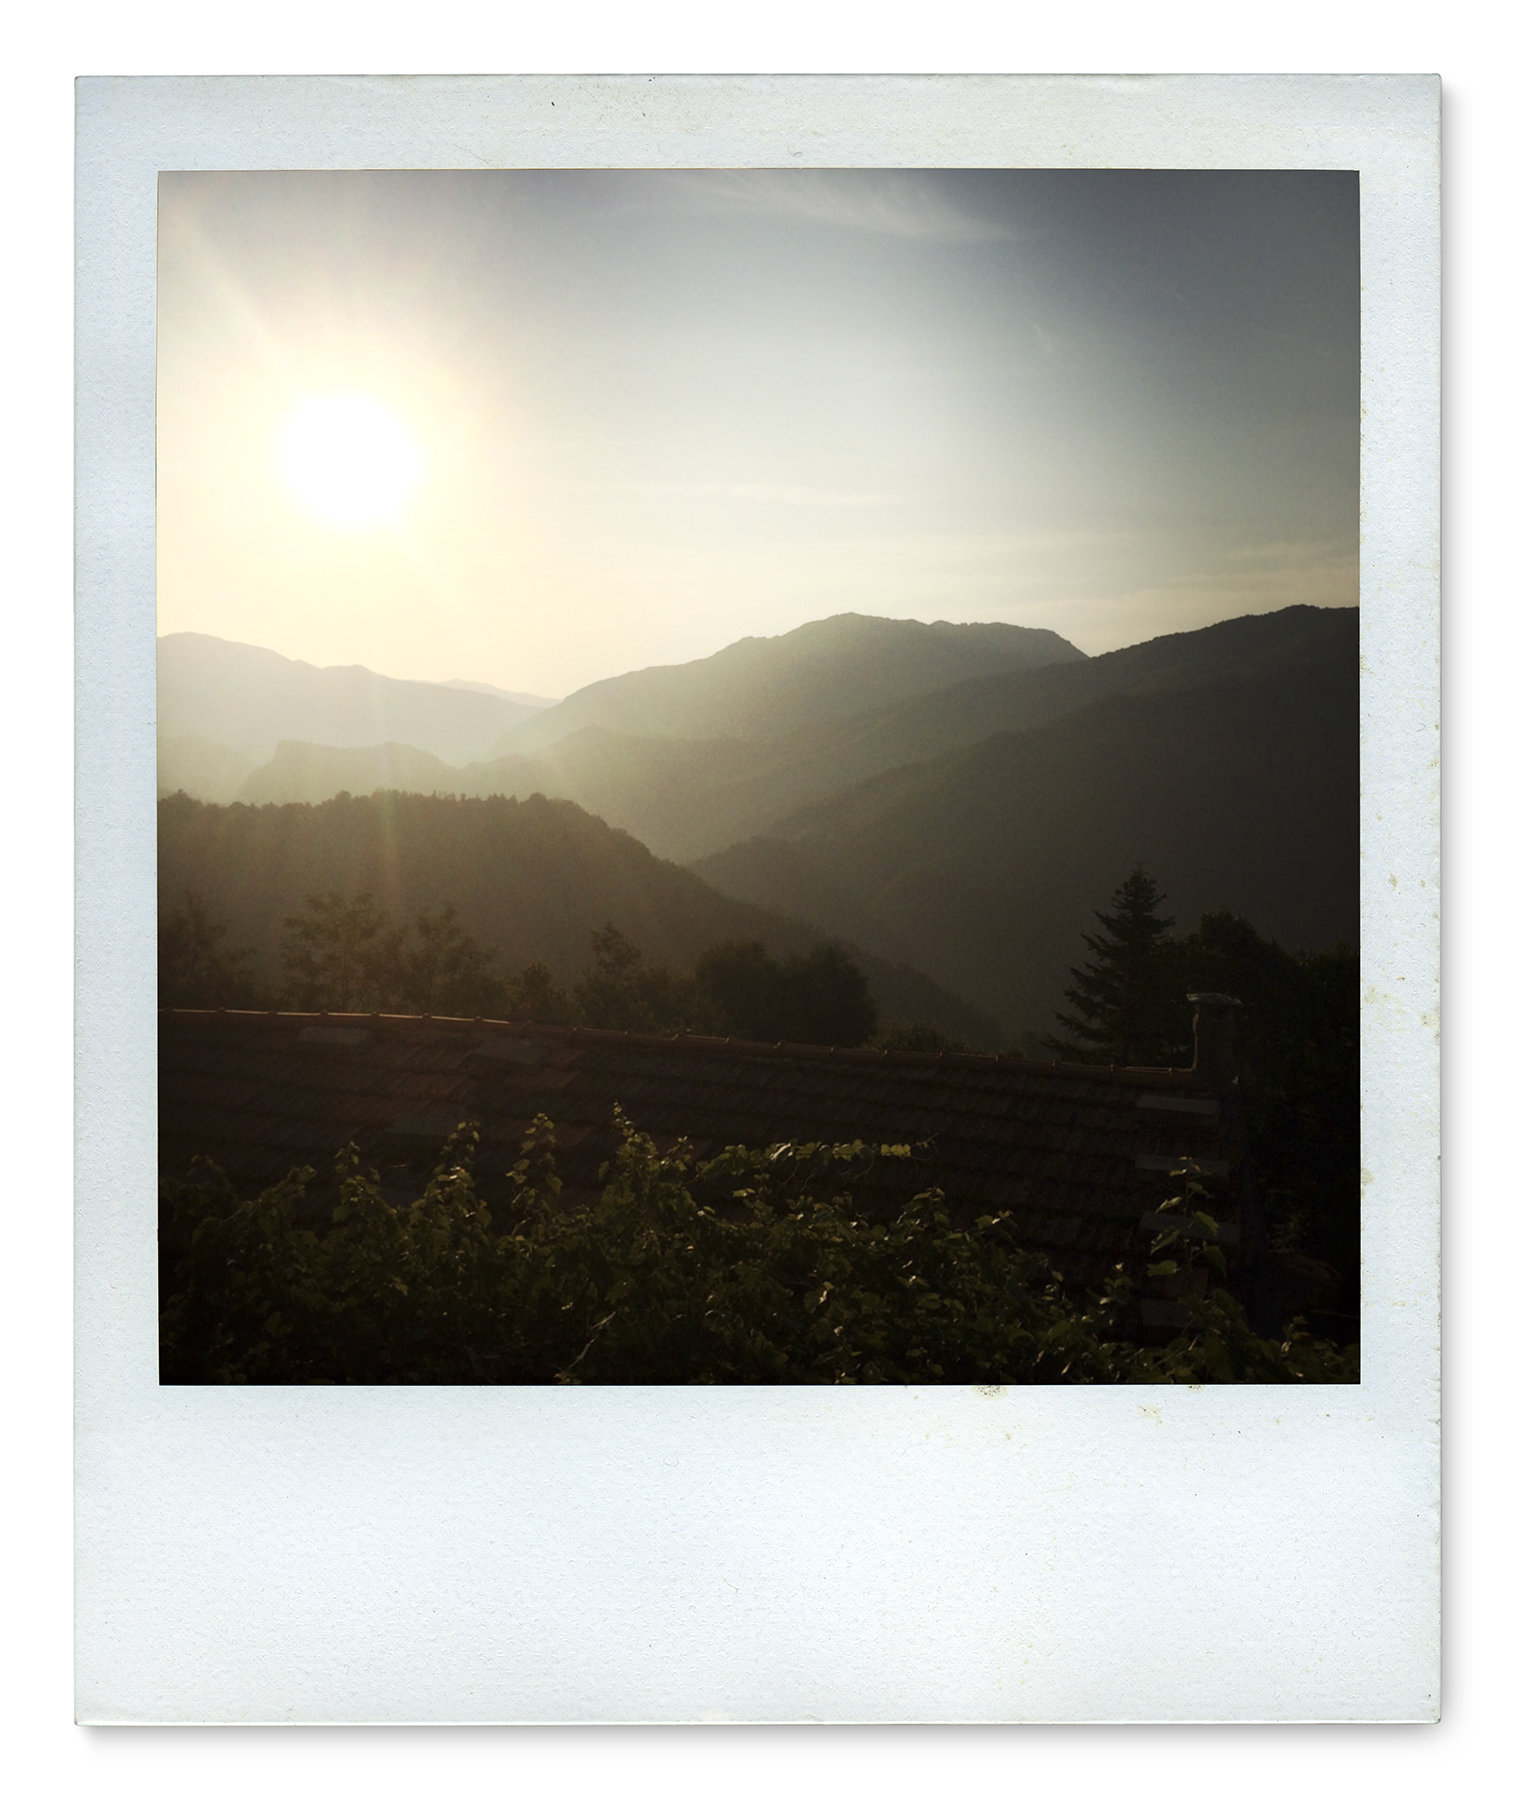 014_Polaroid SX70_IMG_2491.jpg